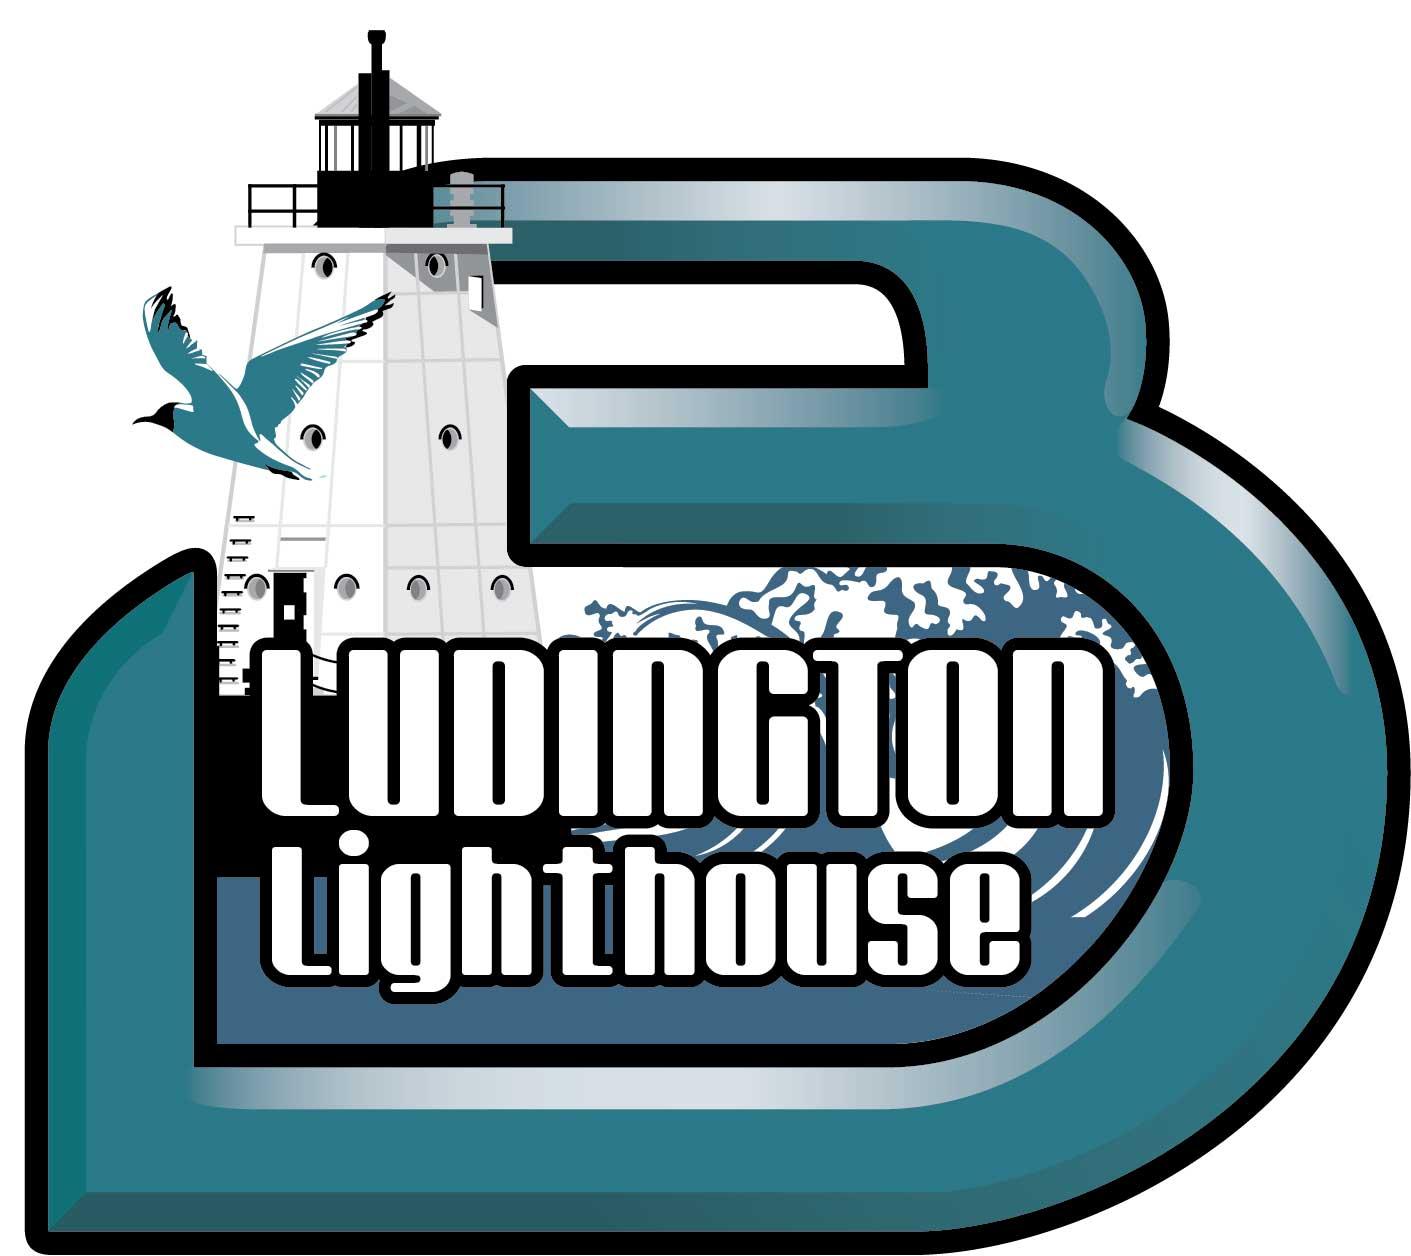 Ludington-Lighthouse Event